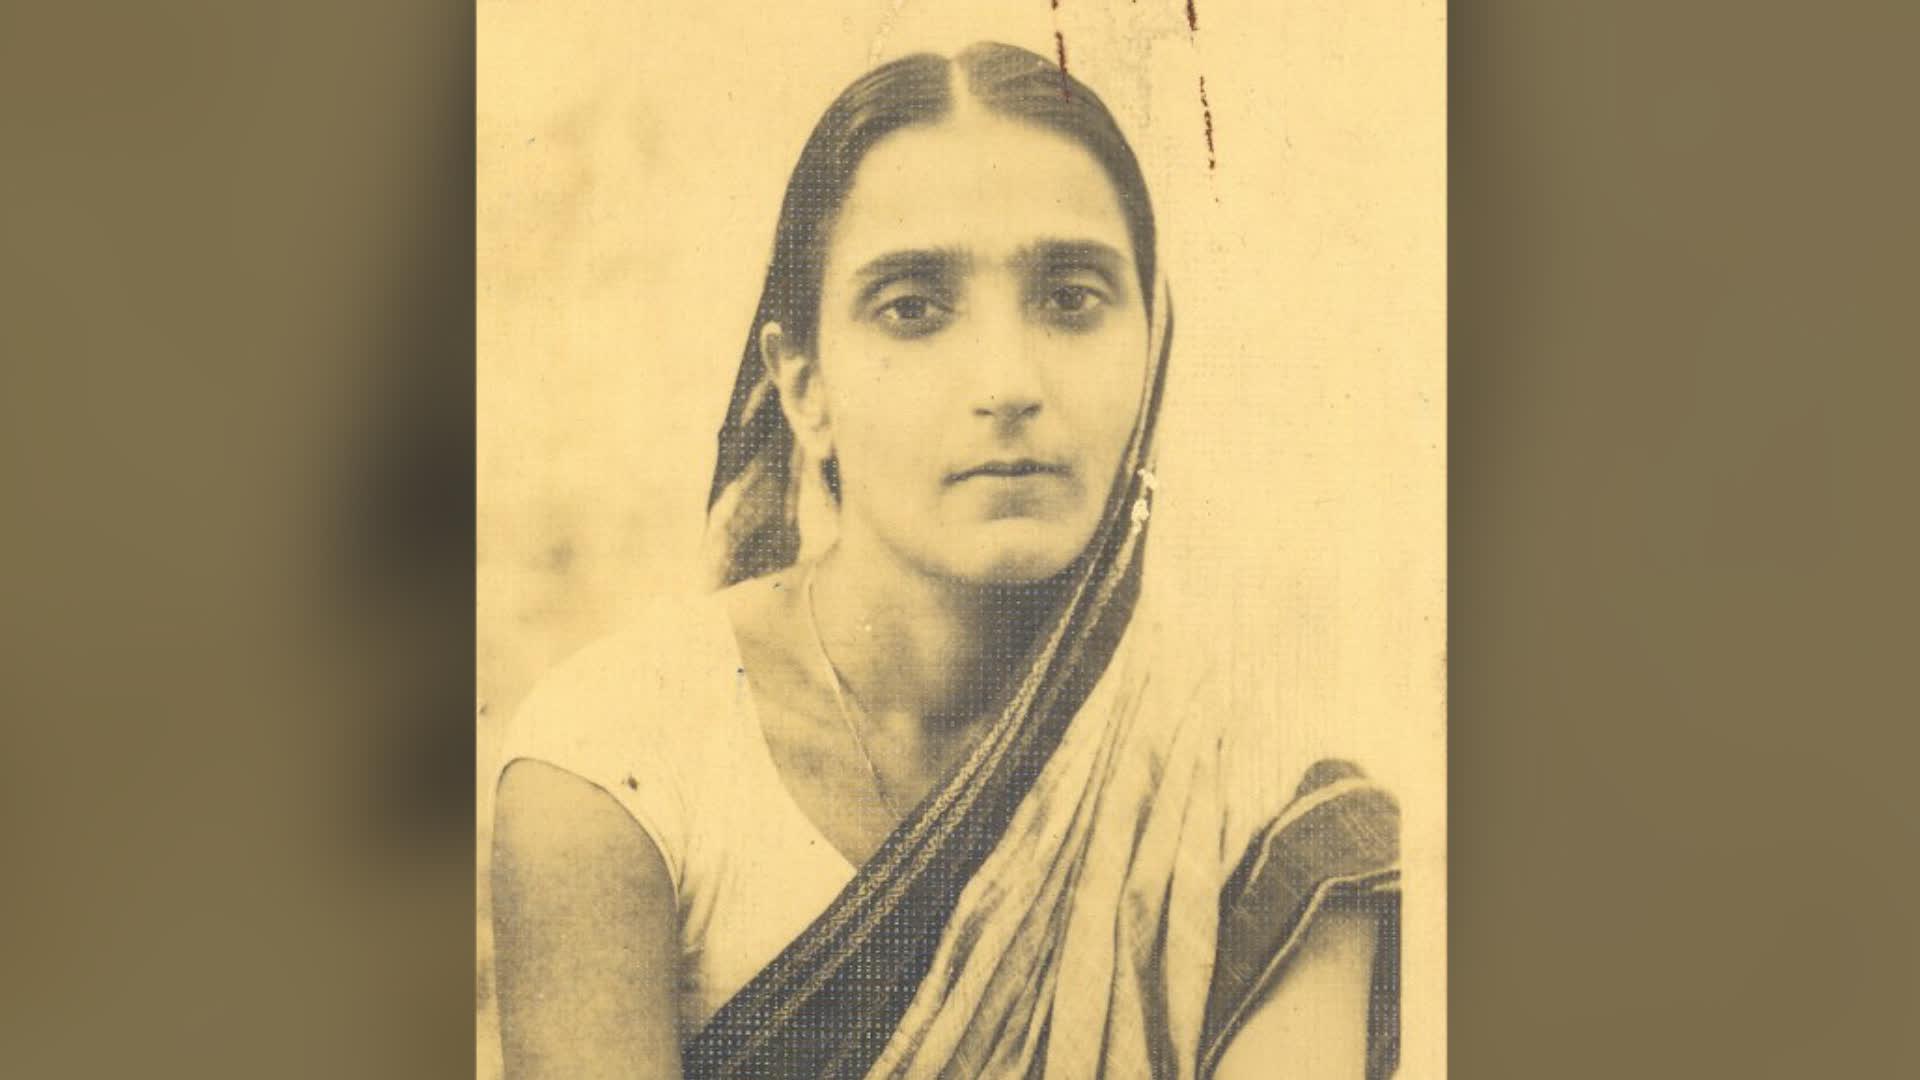 Durga Devi Vohra: 'Wife' of Bhagat Singh